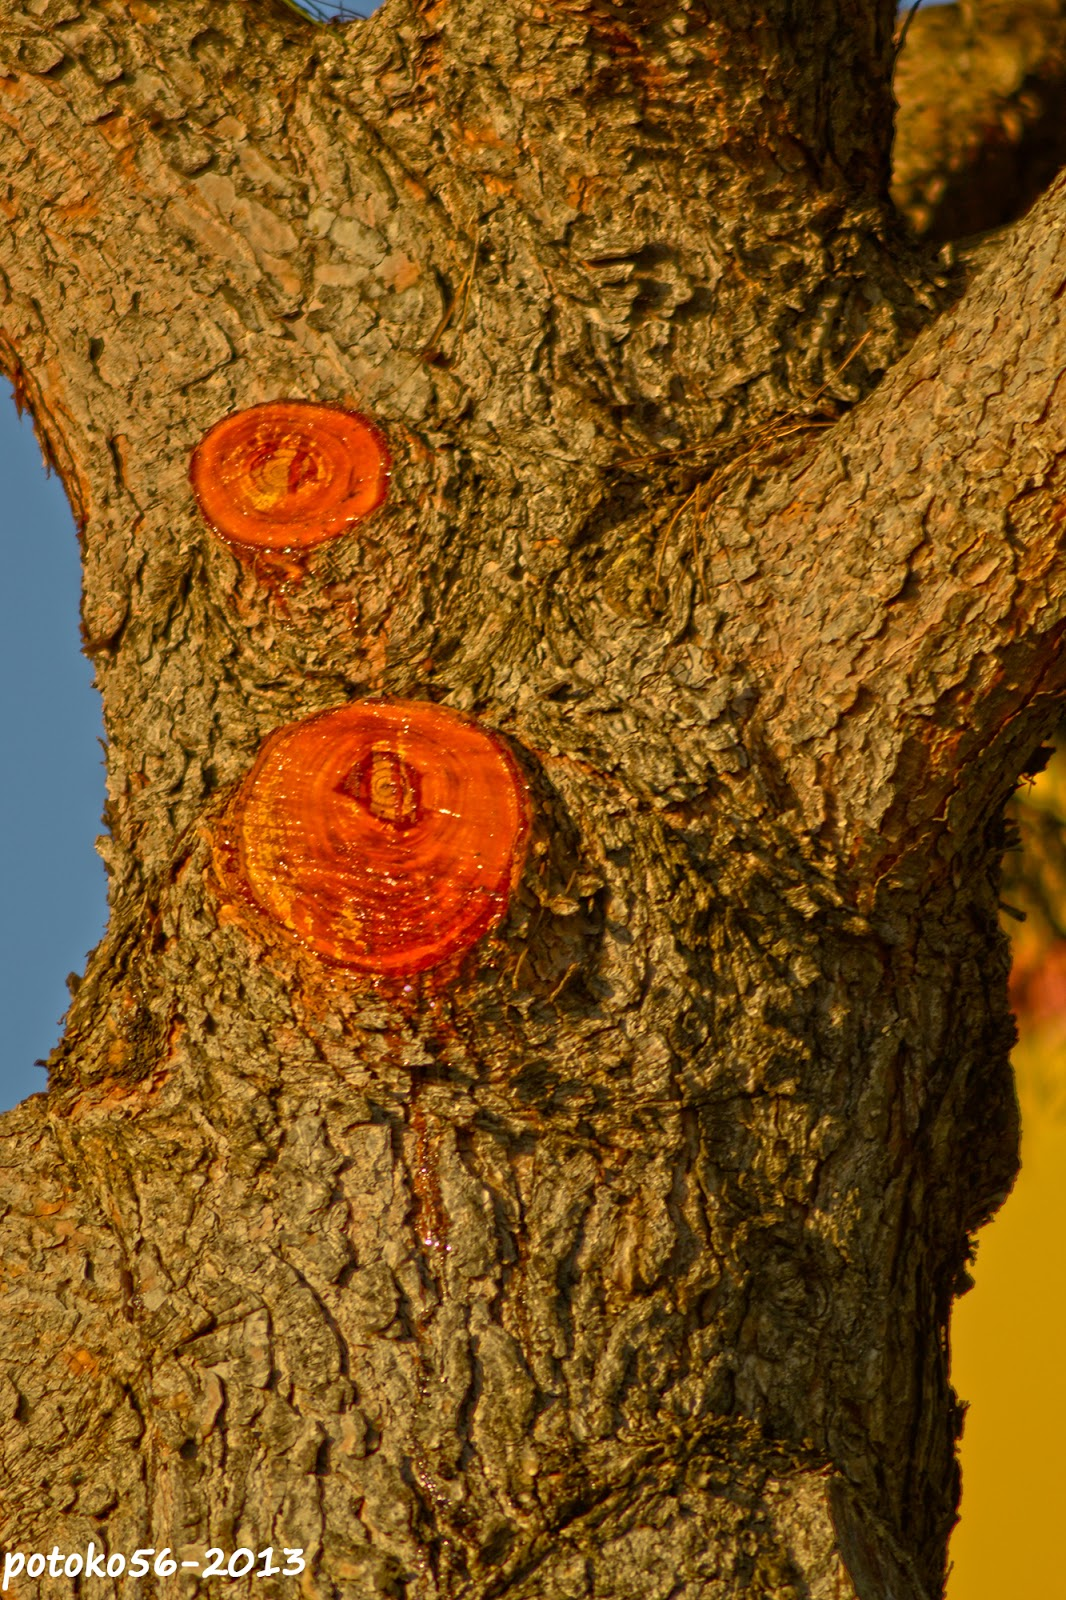 Tronco de pino en Rota